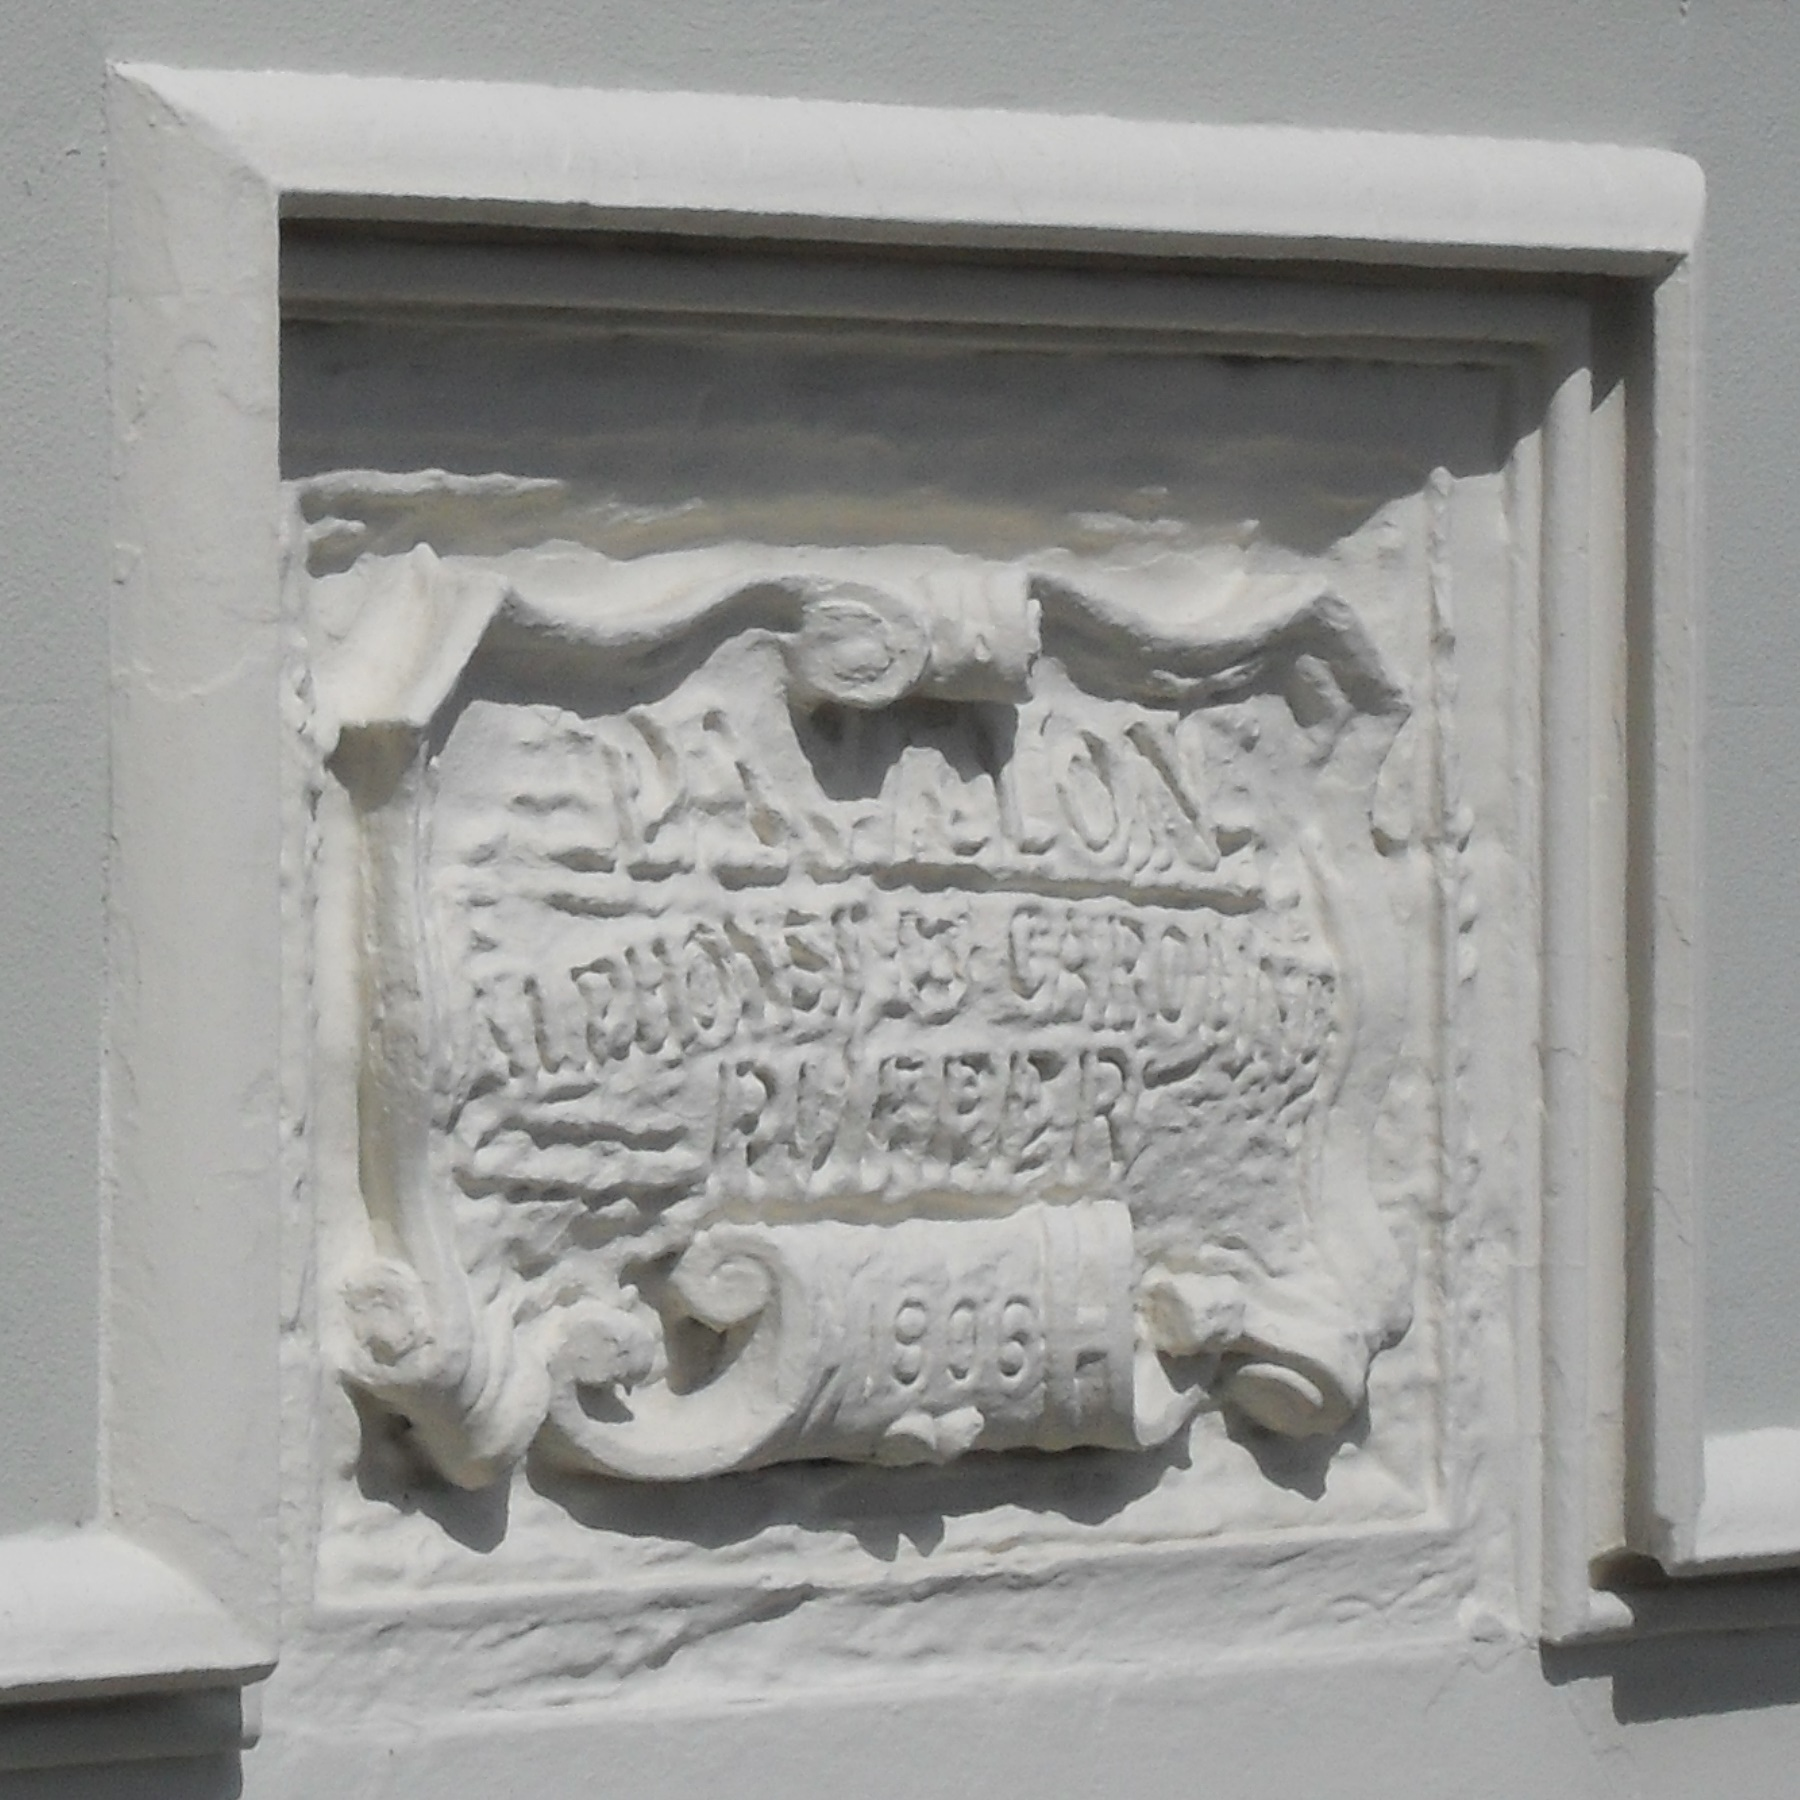 File Plaque At French Convalescent Home De Courcel Road Brighton 1